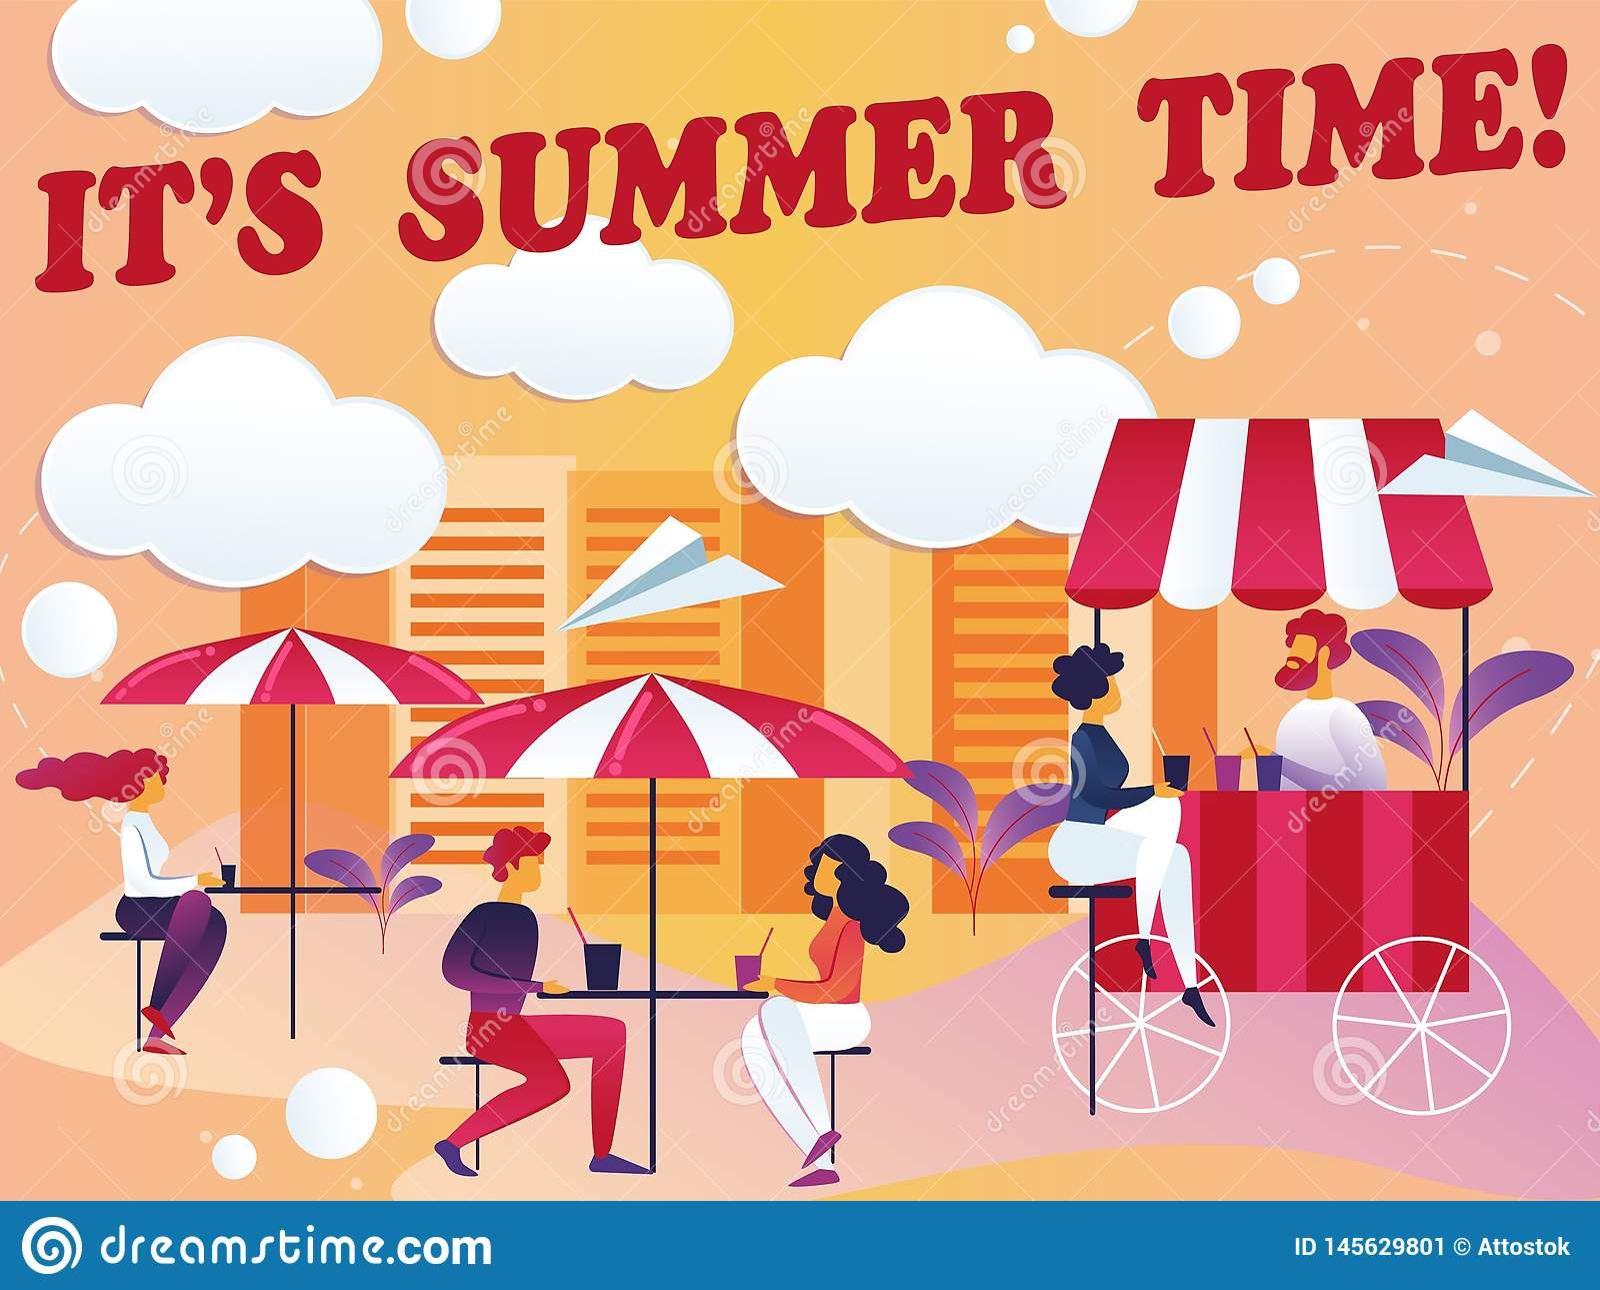 Inscription its Summer Time Vector Illustration.